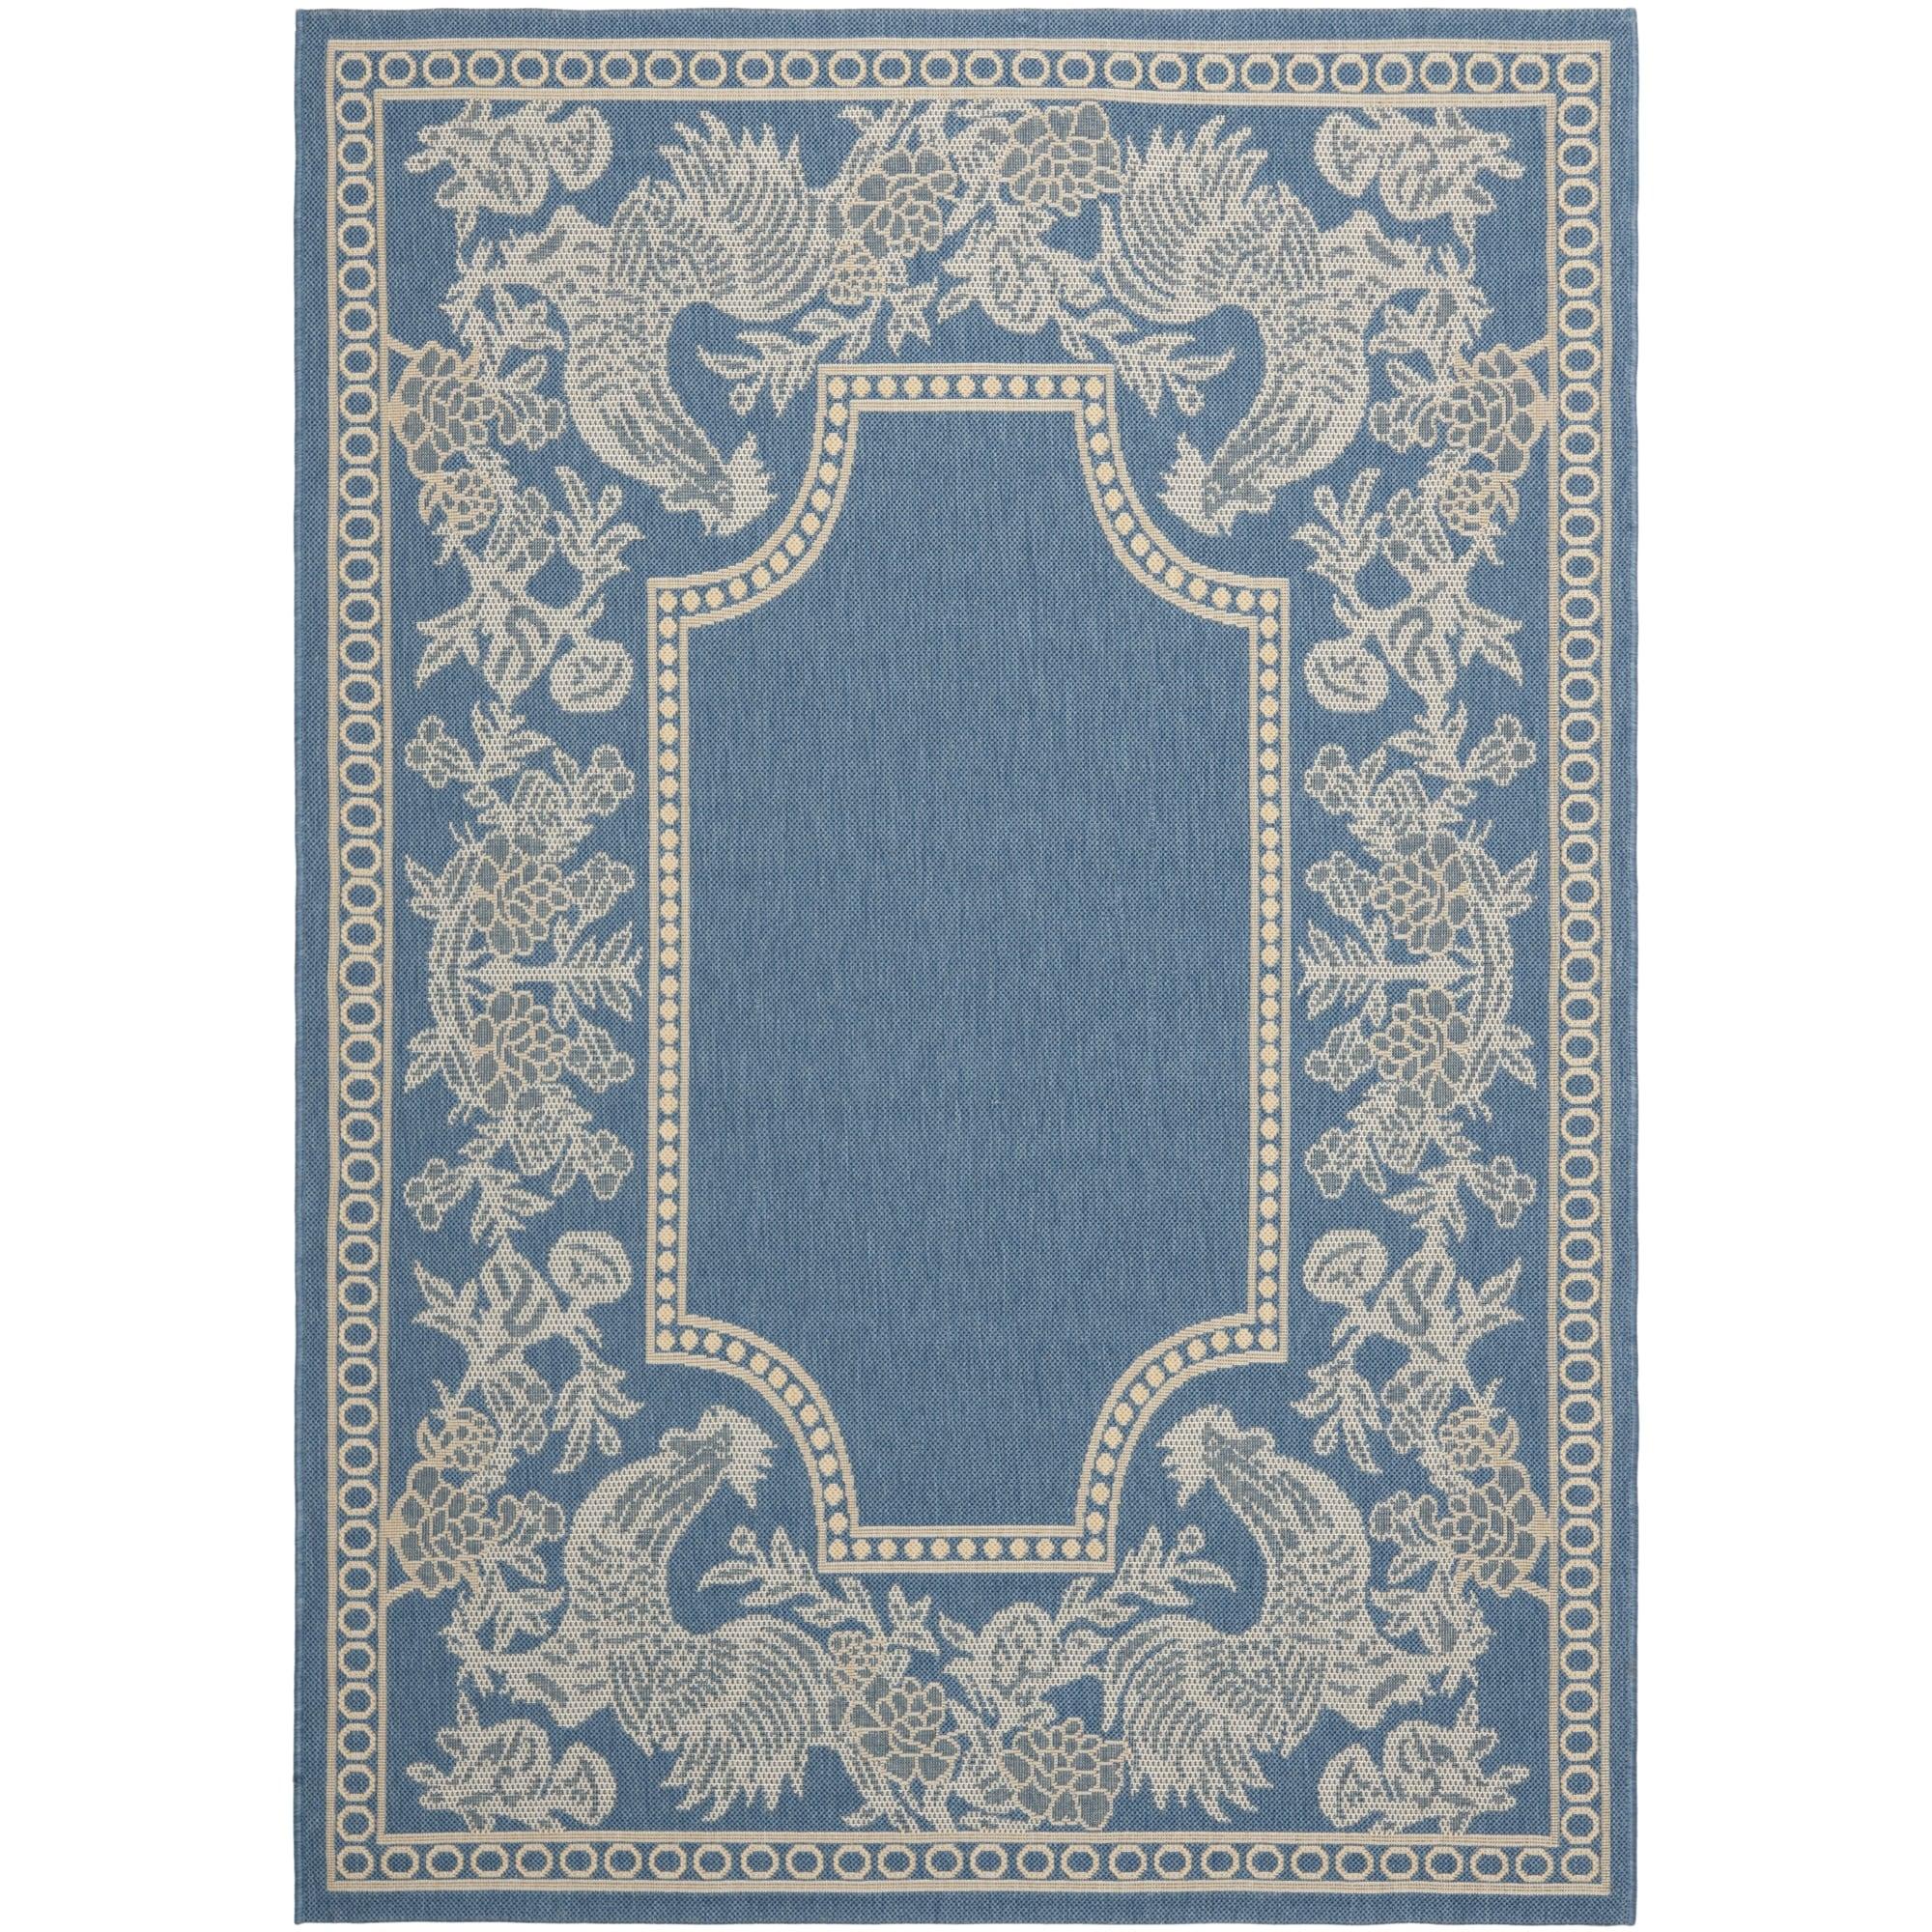 Safavieh Rooster Blue/ Natural Indoor/ Outdoor Rug | eBay